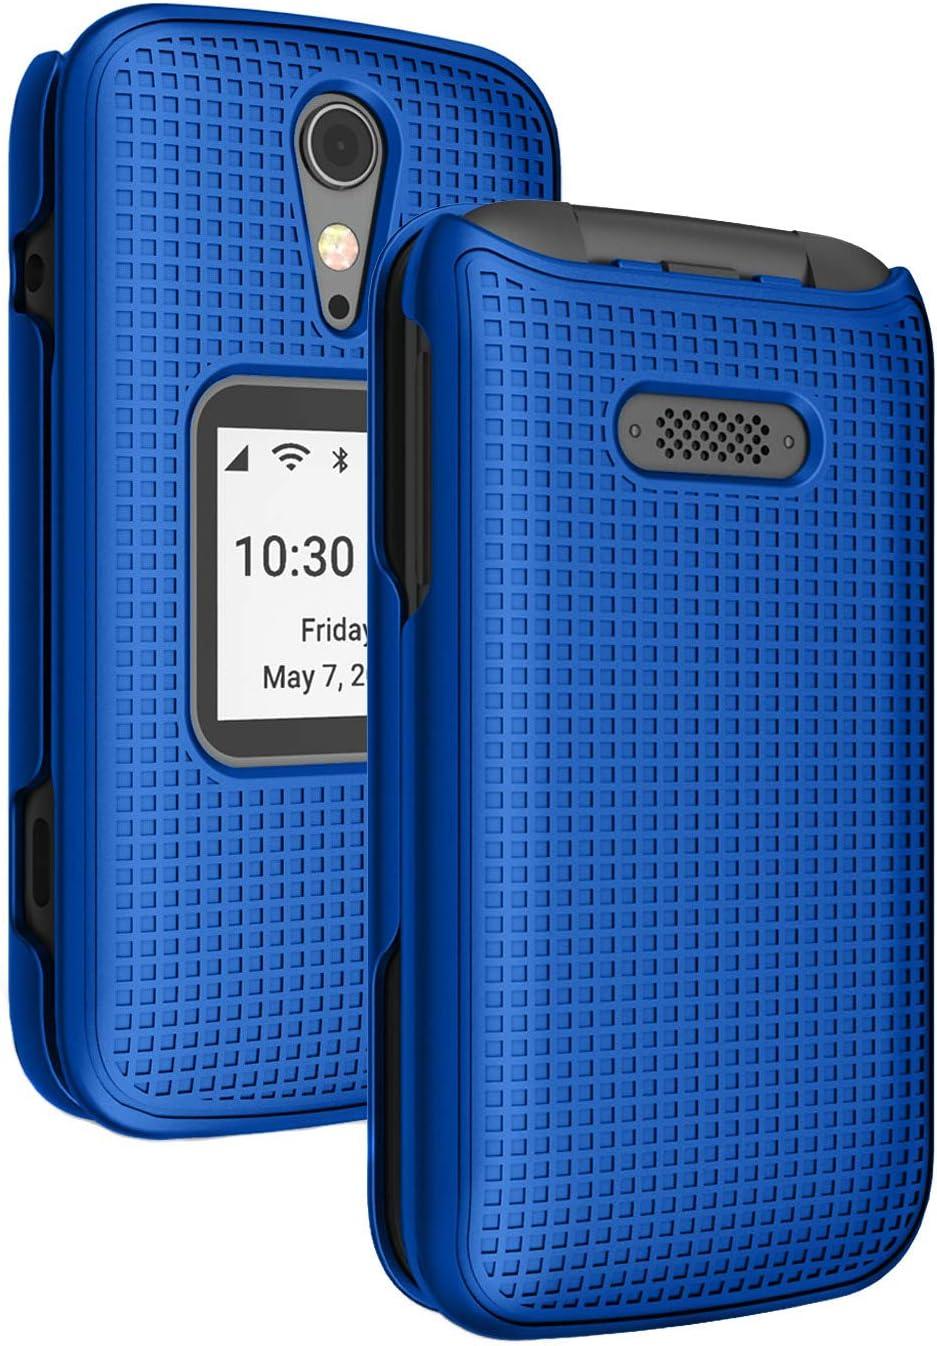 Case for Jitterbug Flip2, Nakedcellphone [Cobalt Blue] Protective Snap-On Hard Shell Cover [Grid Texture] for Jitterbug Flip 2 Phone (aka Lively Flip) (4053SJ7)